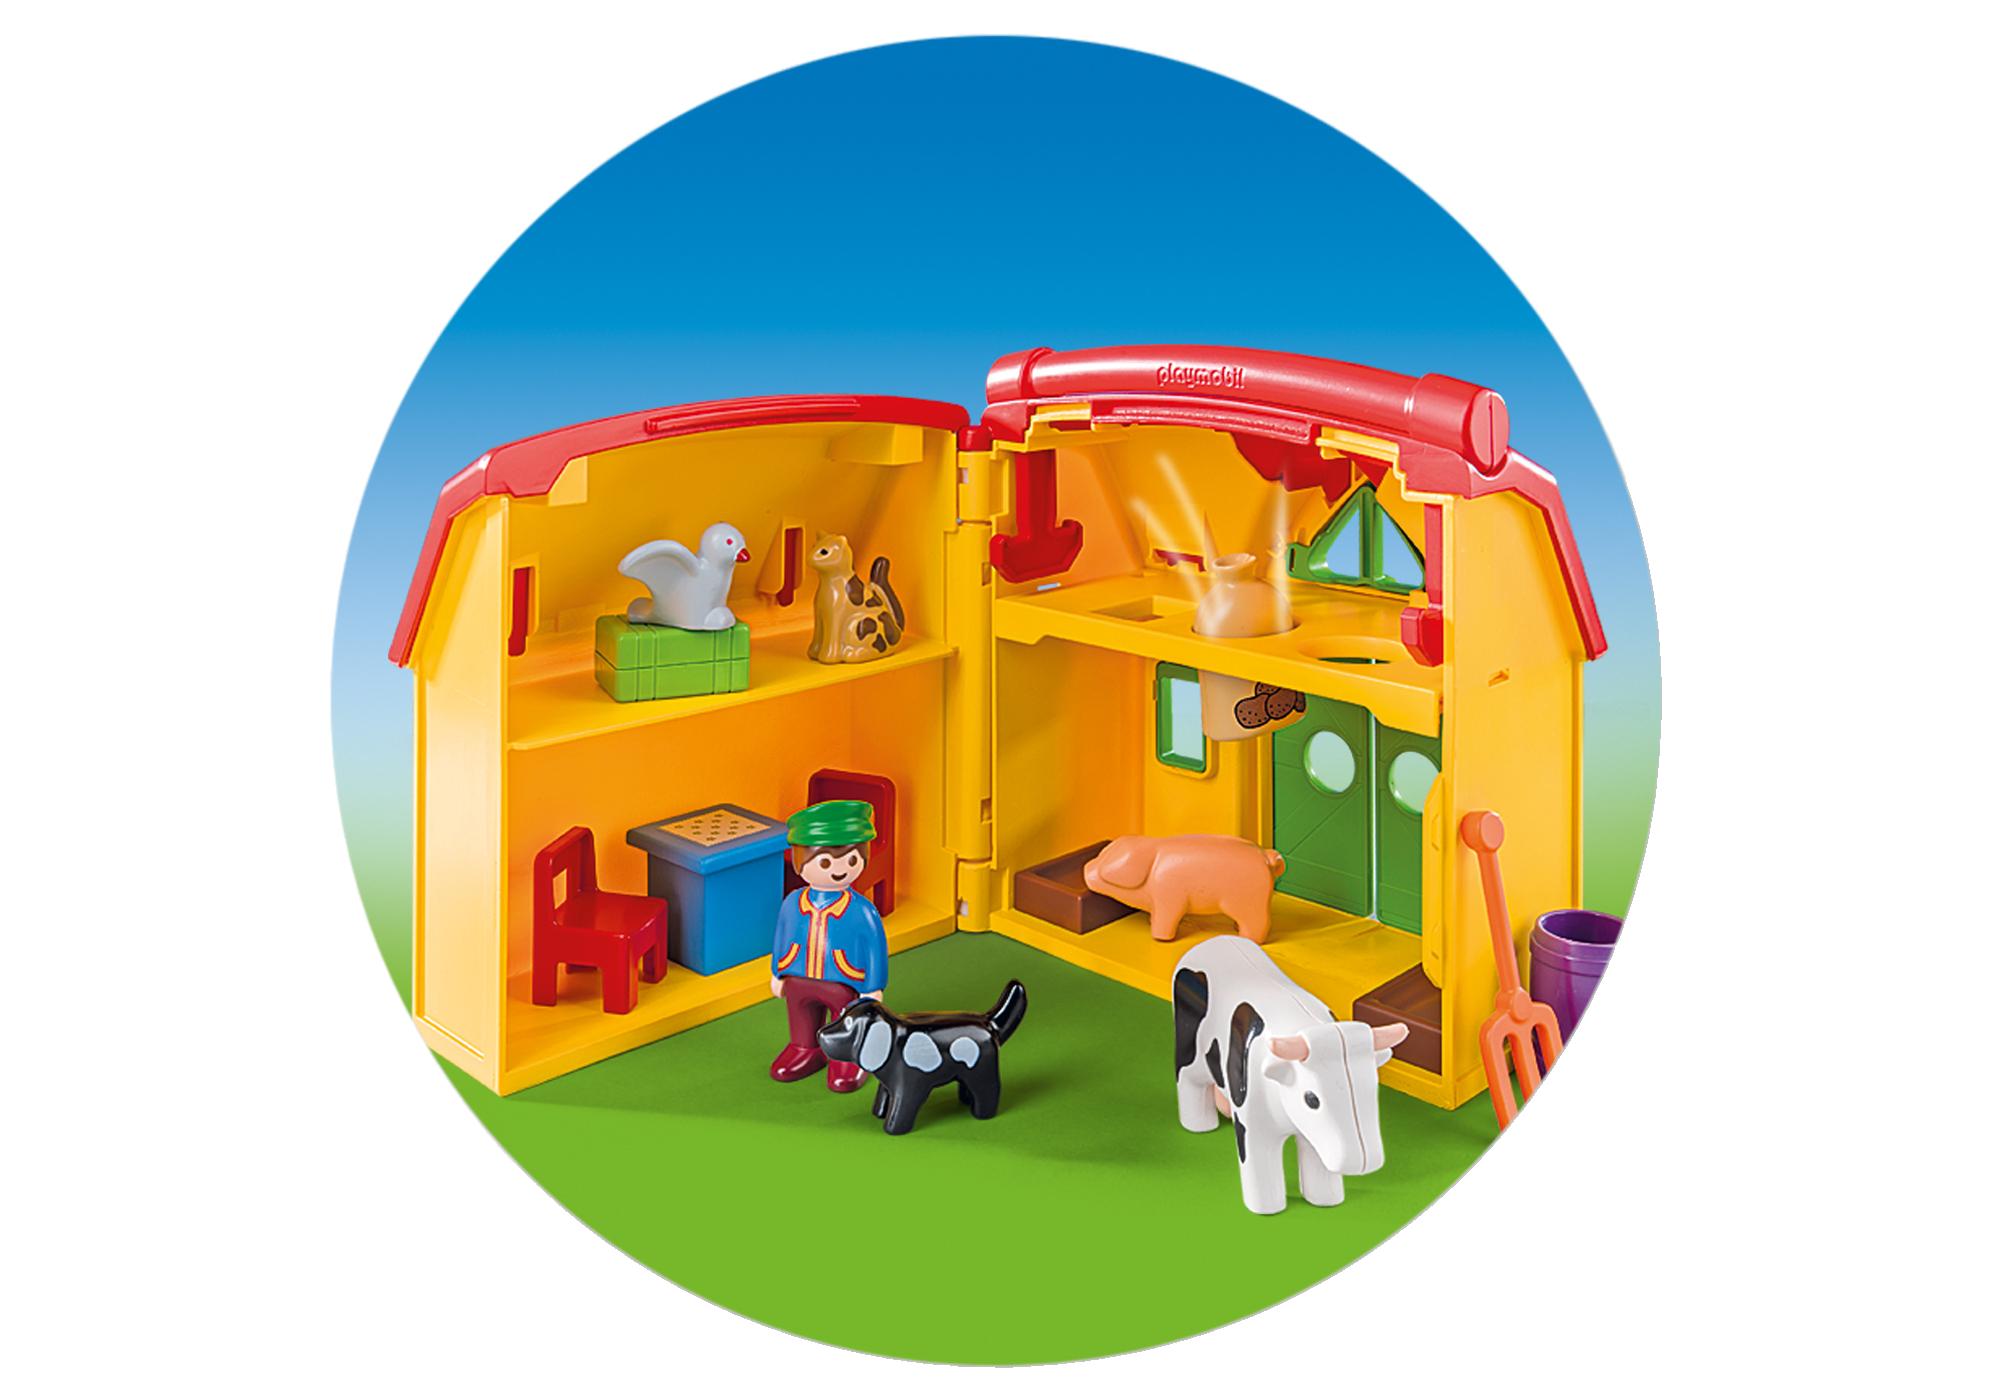 http://media.playmobil.com/i/playmobil/6962_product_extra3/Meeneemboerderij met dieren